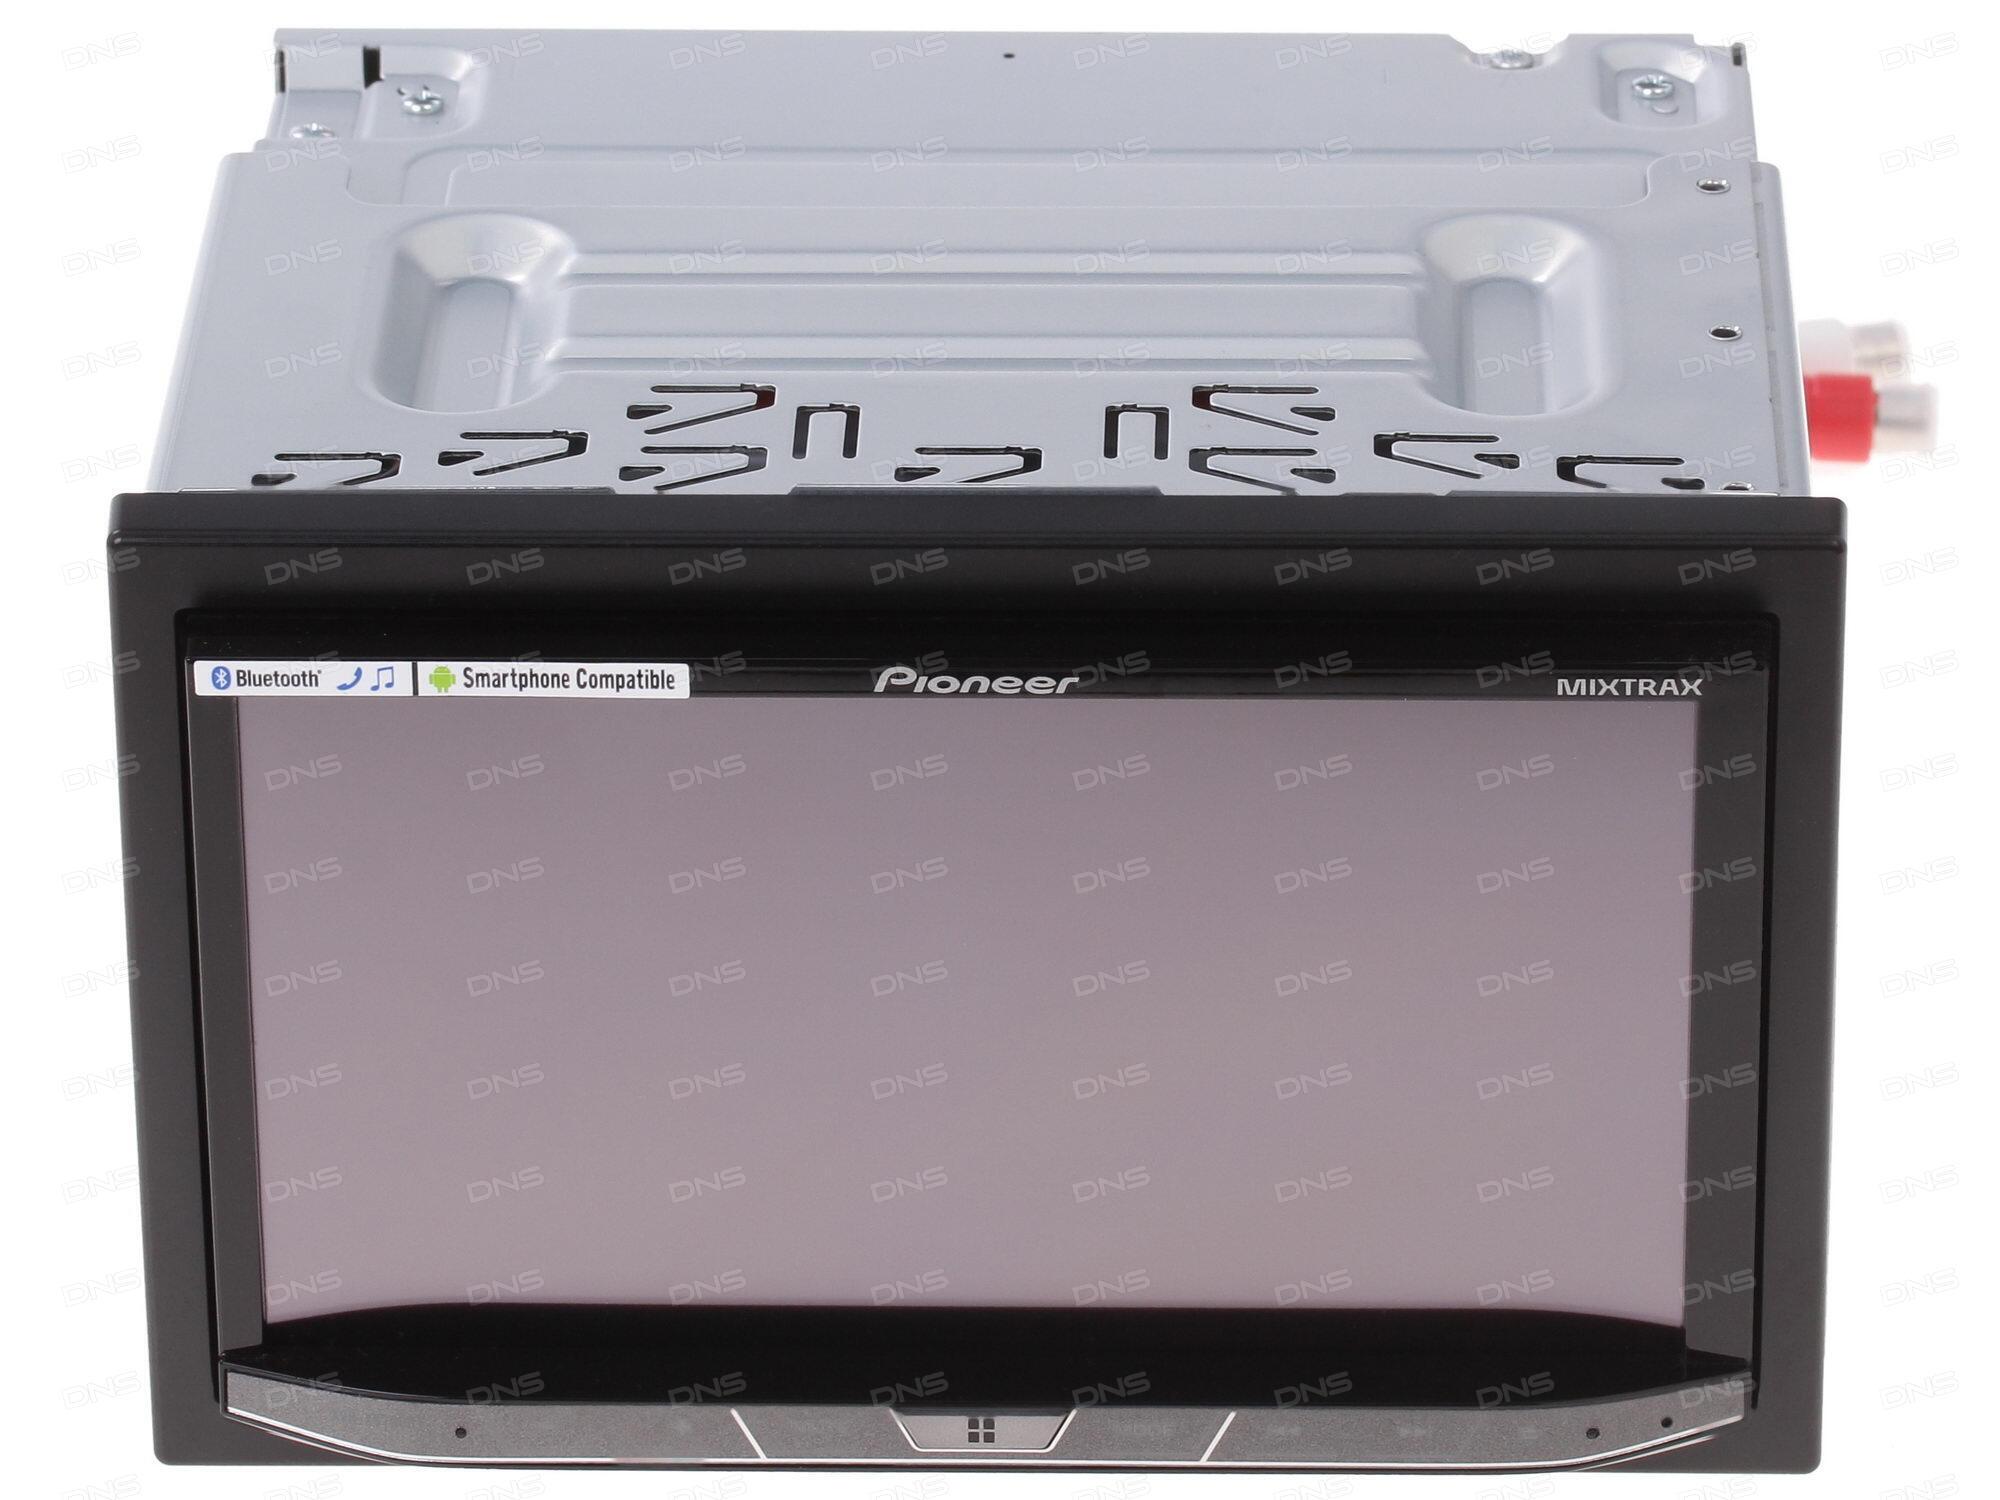 pioneer avh x8700bt spotify installieren 2000 jeep grand cherokee ignition switch wiring diagram Купить Автопроигрыватель в интернет